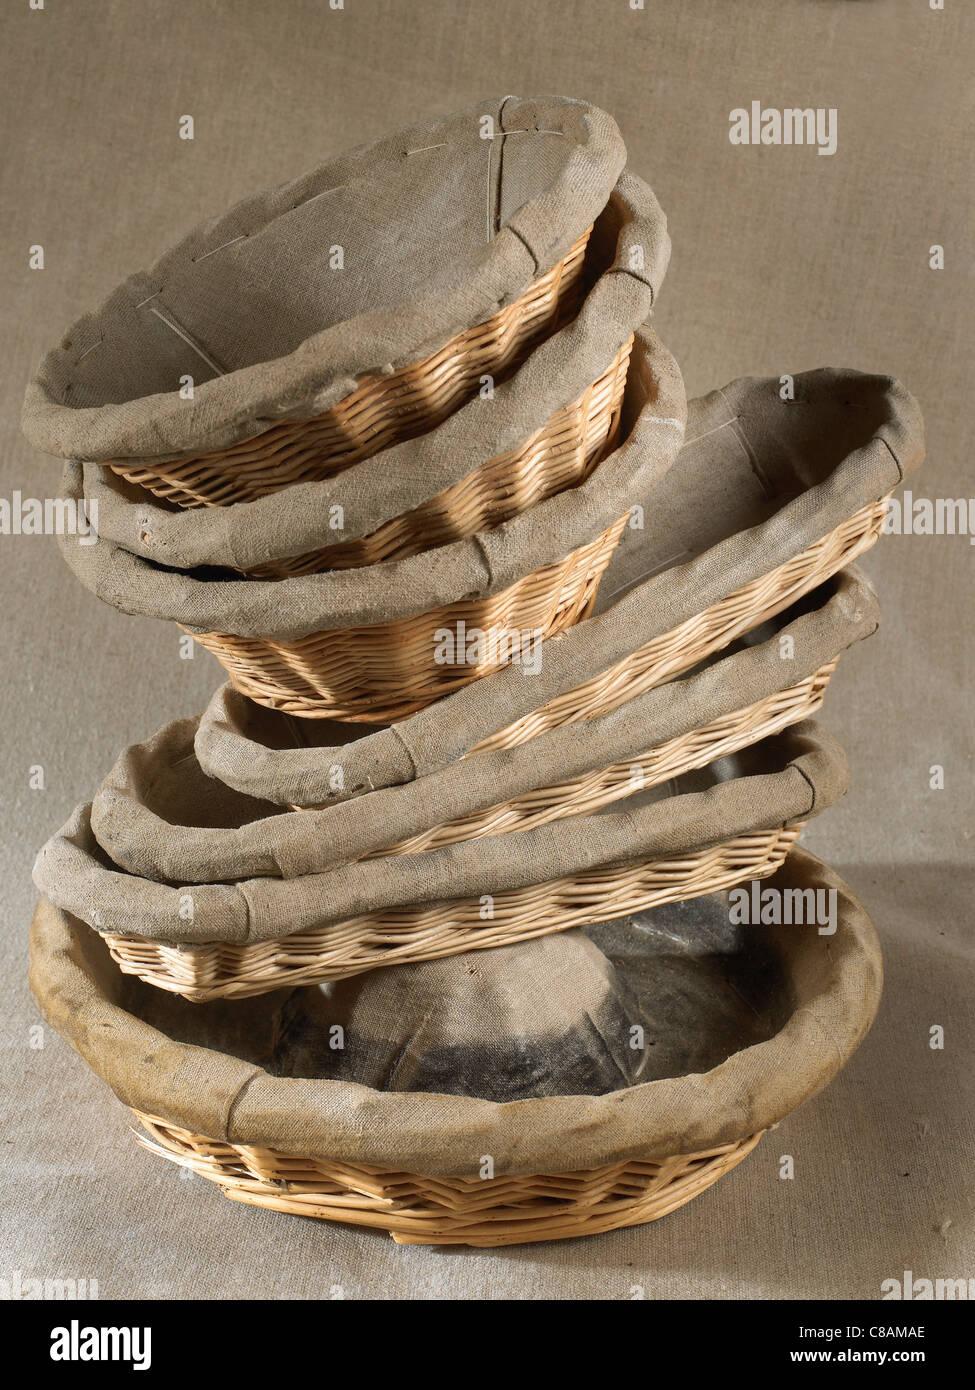 Bread baskets - Stock Image